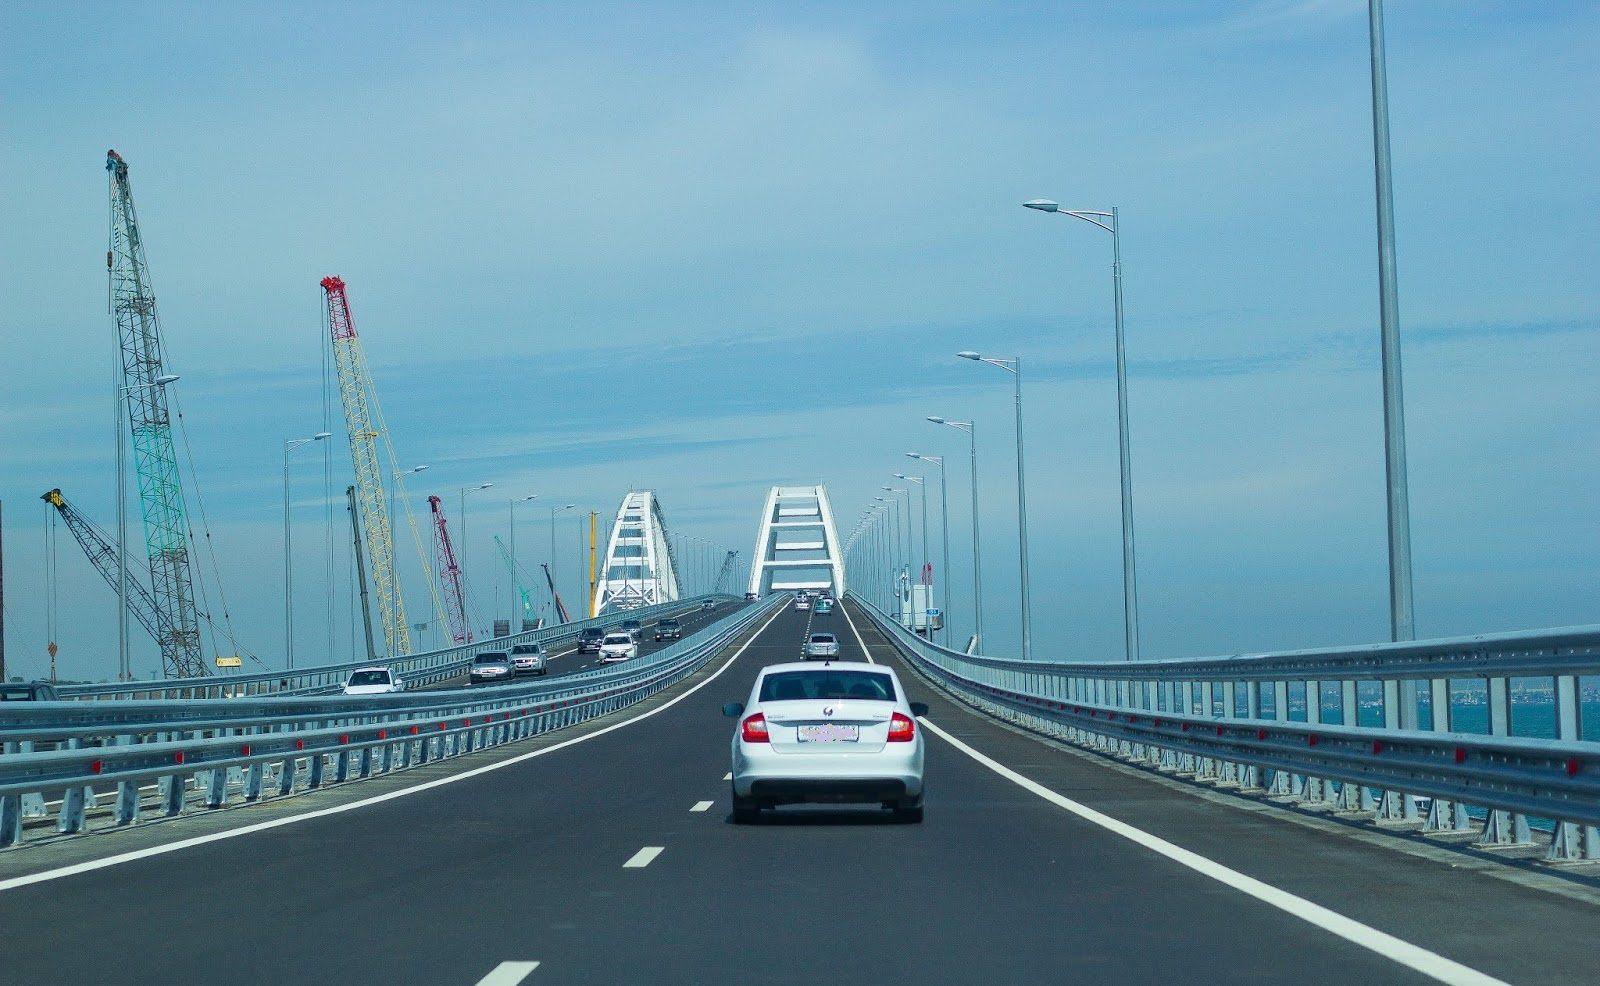 крым, мост, суд